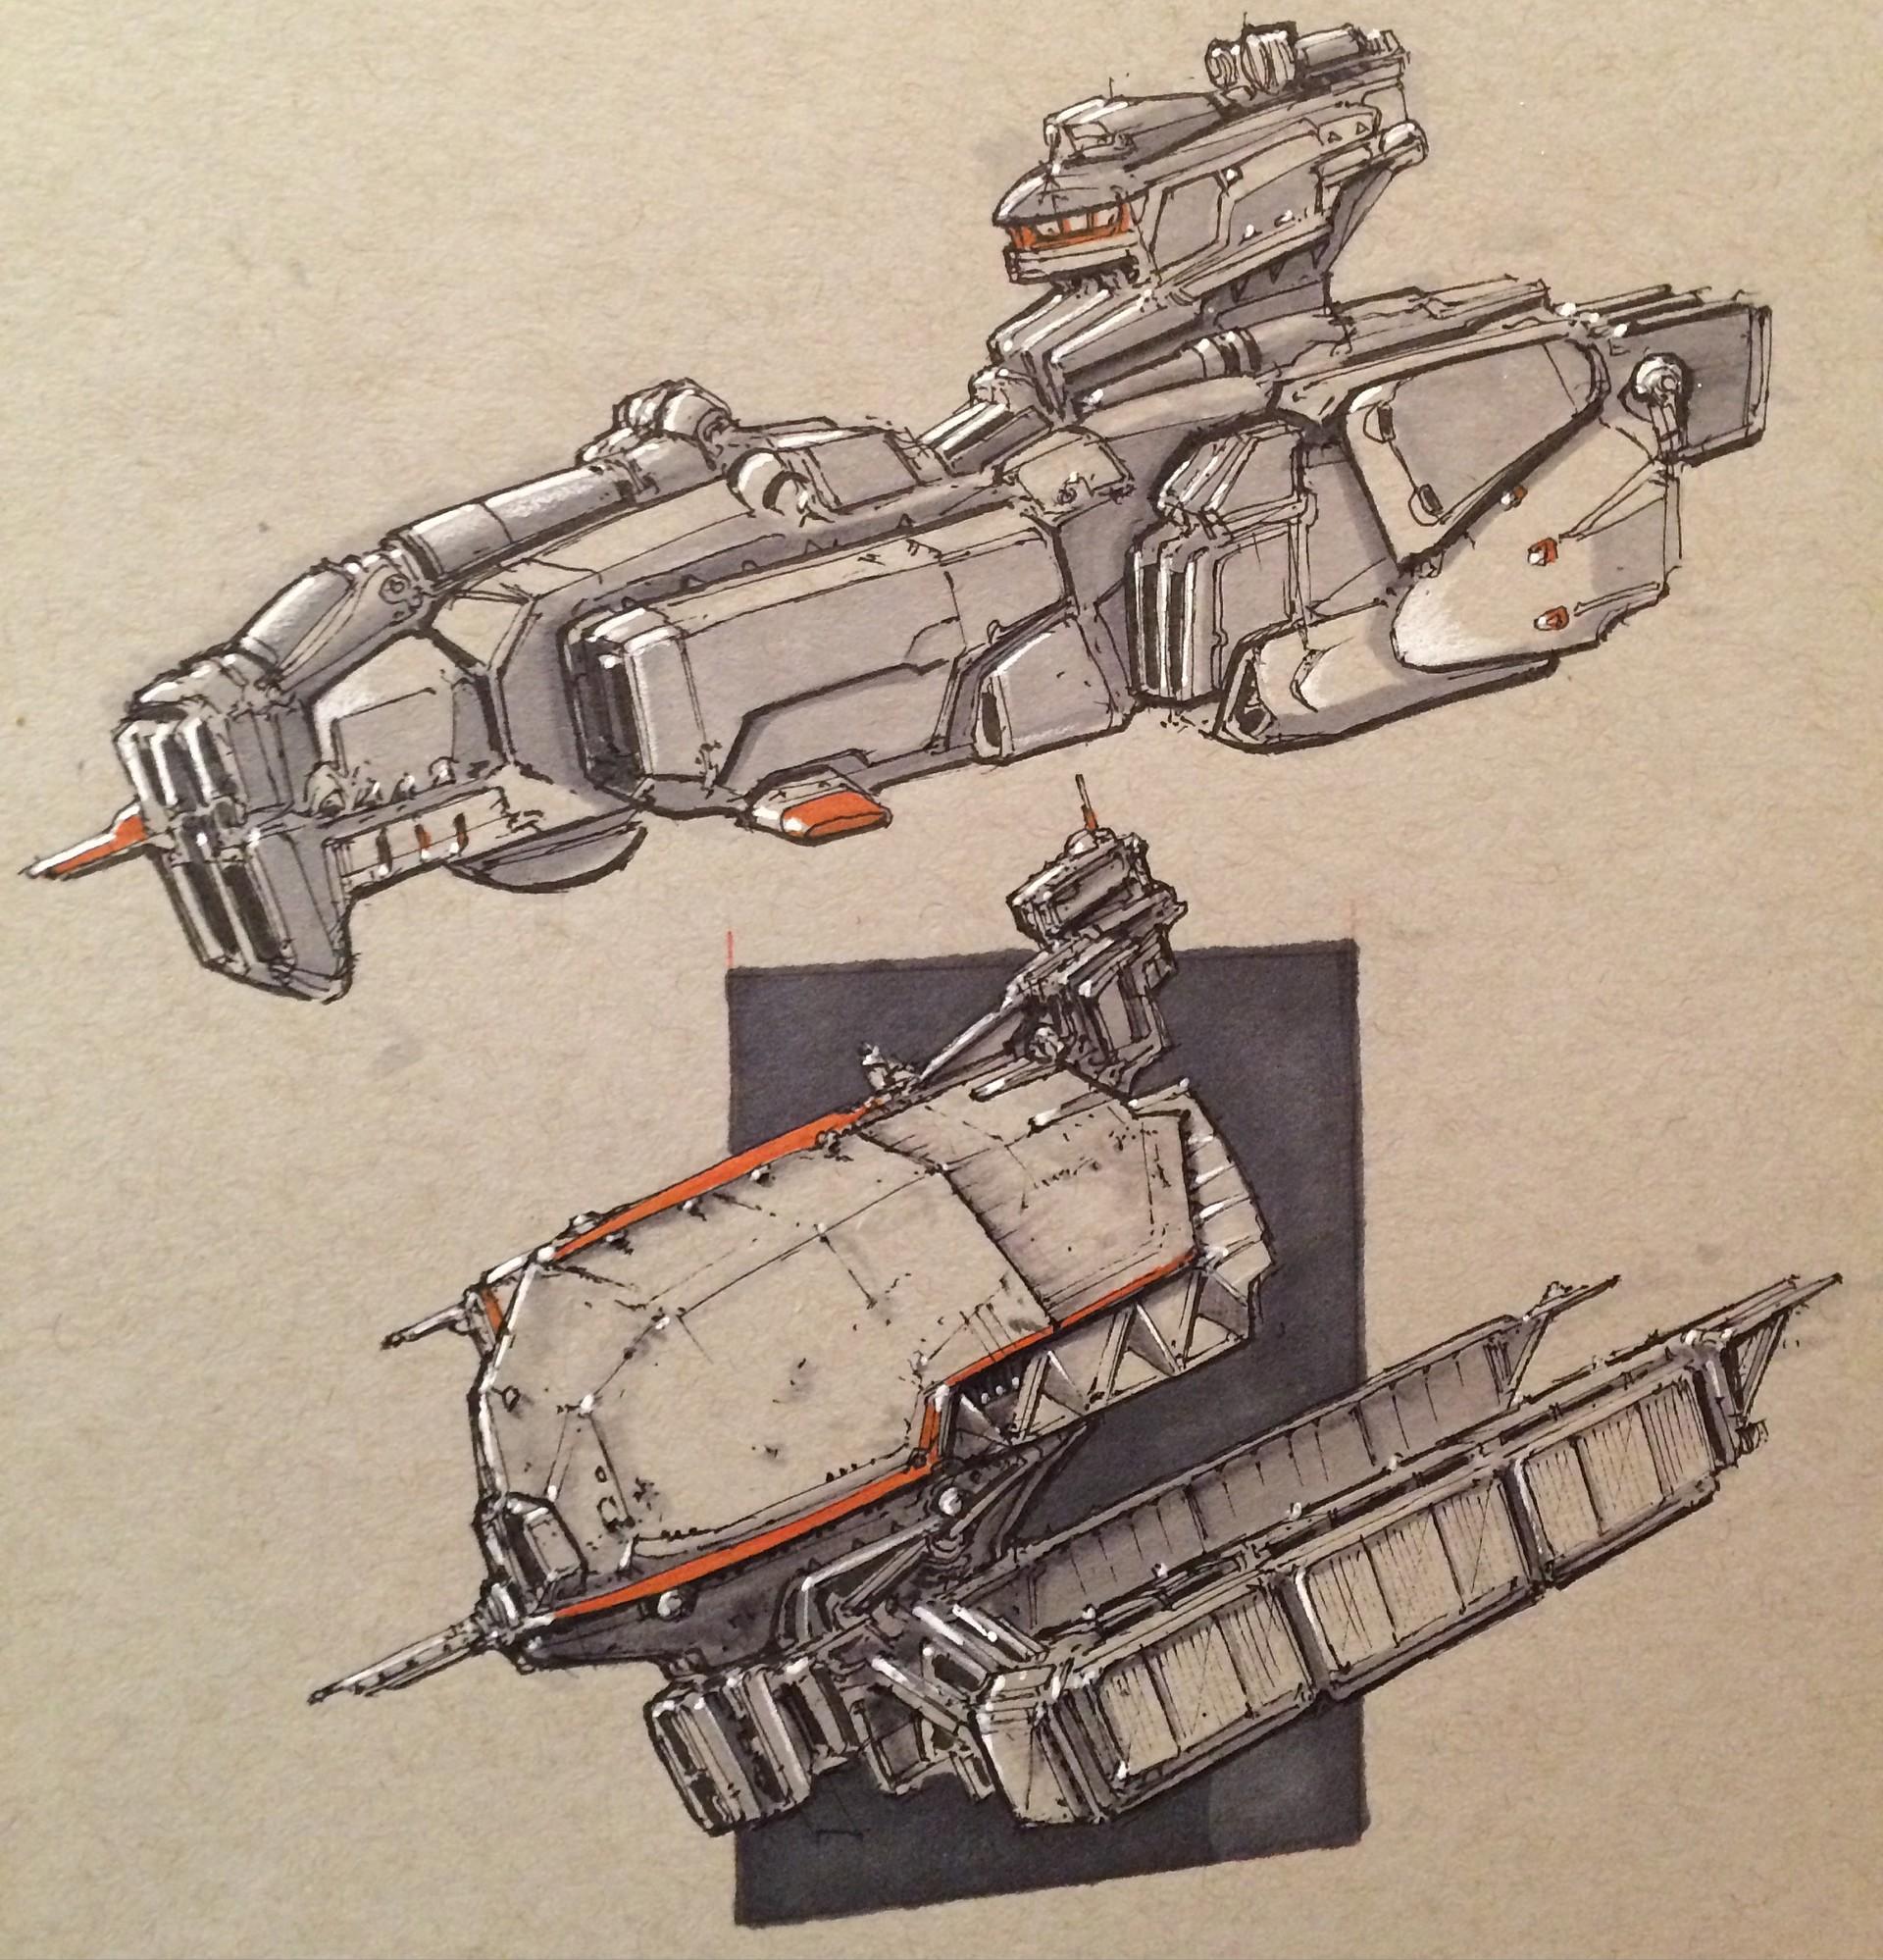 Drawn spaceship junker  Sketches Virnard Virnard corvettes